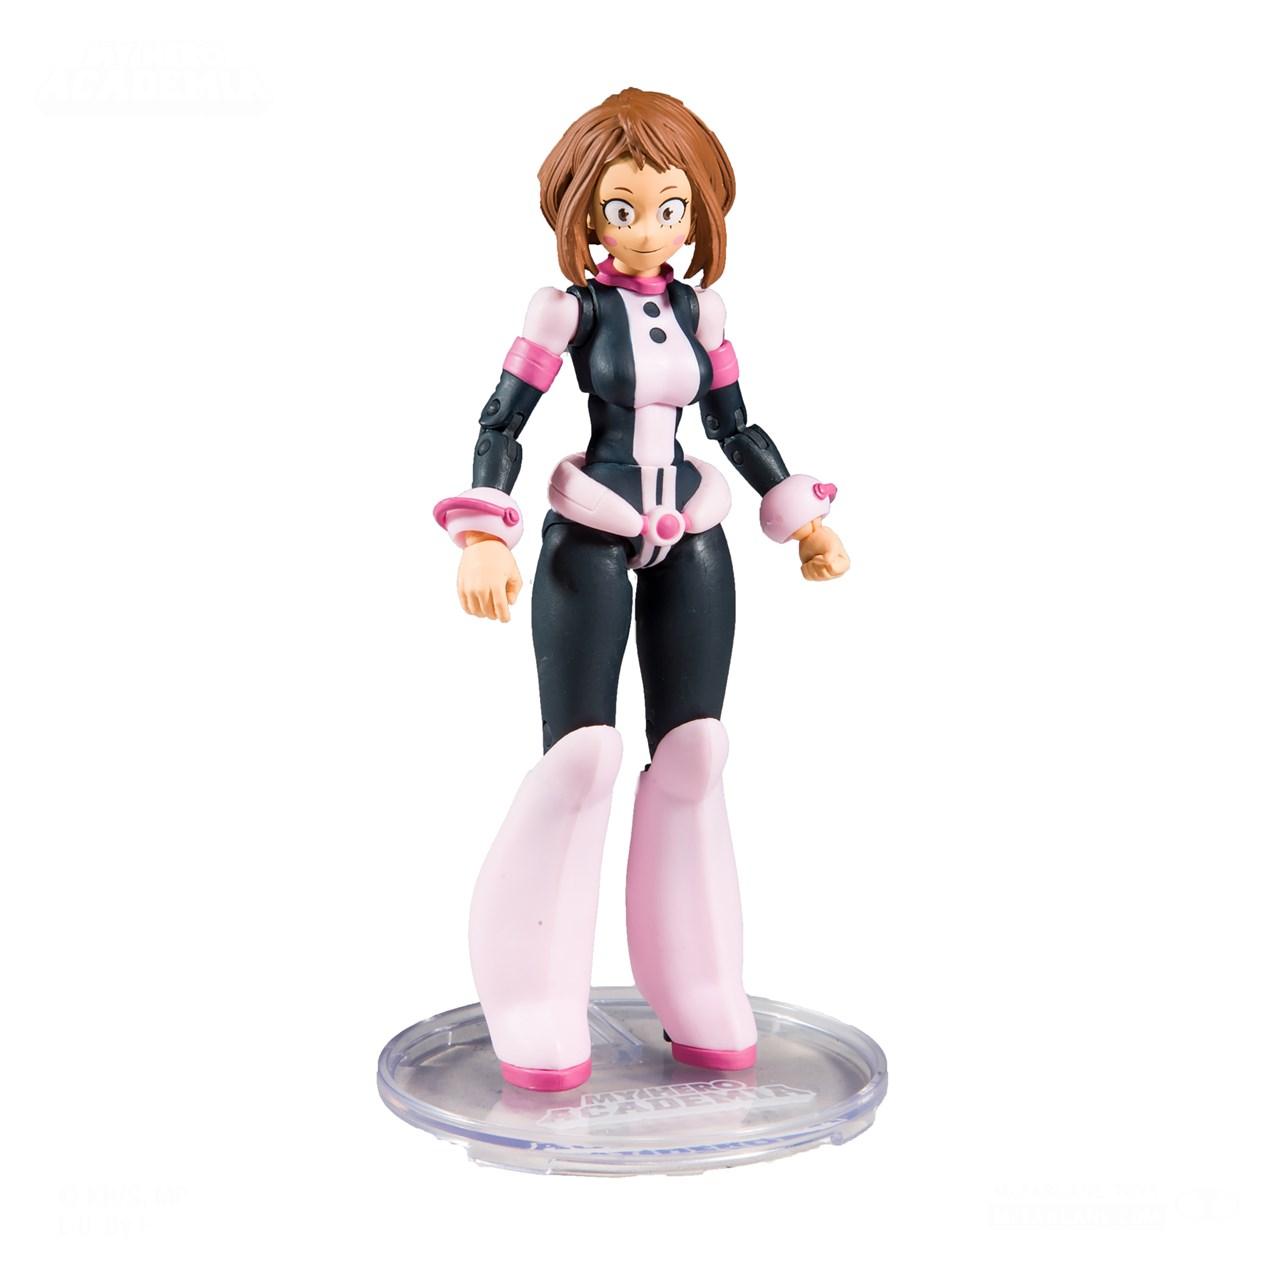 My Hero Academia: Ochaco Uraraka Figurine - 2